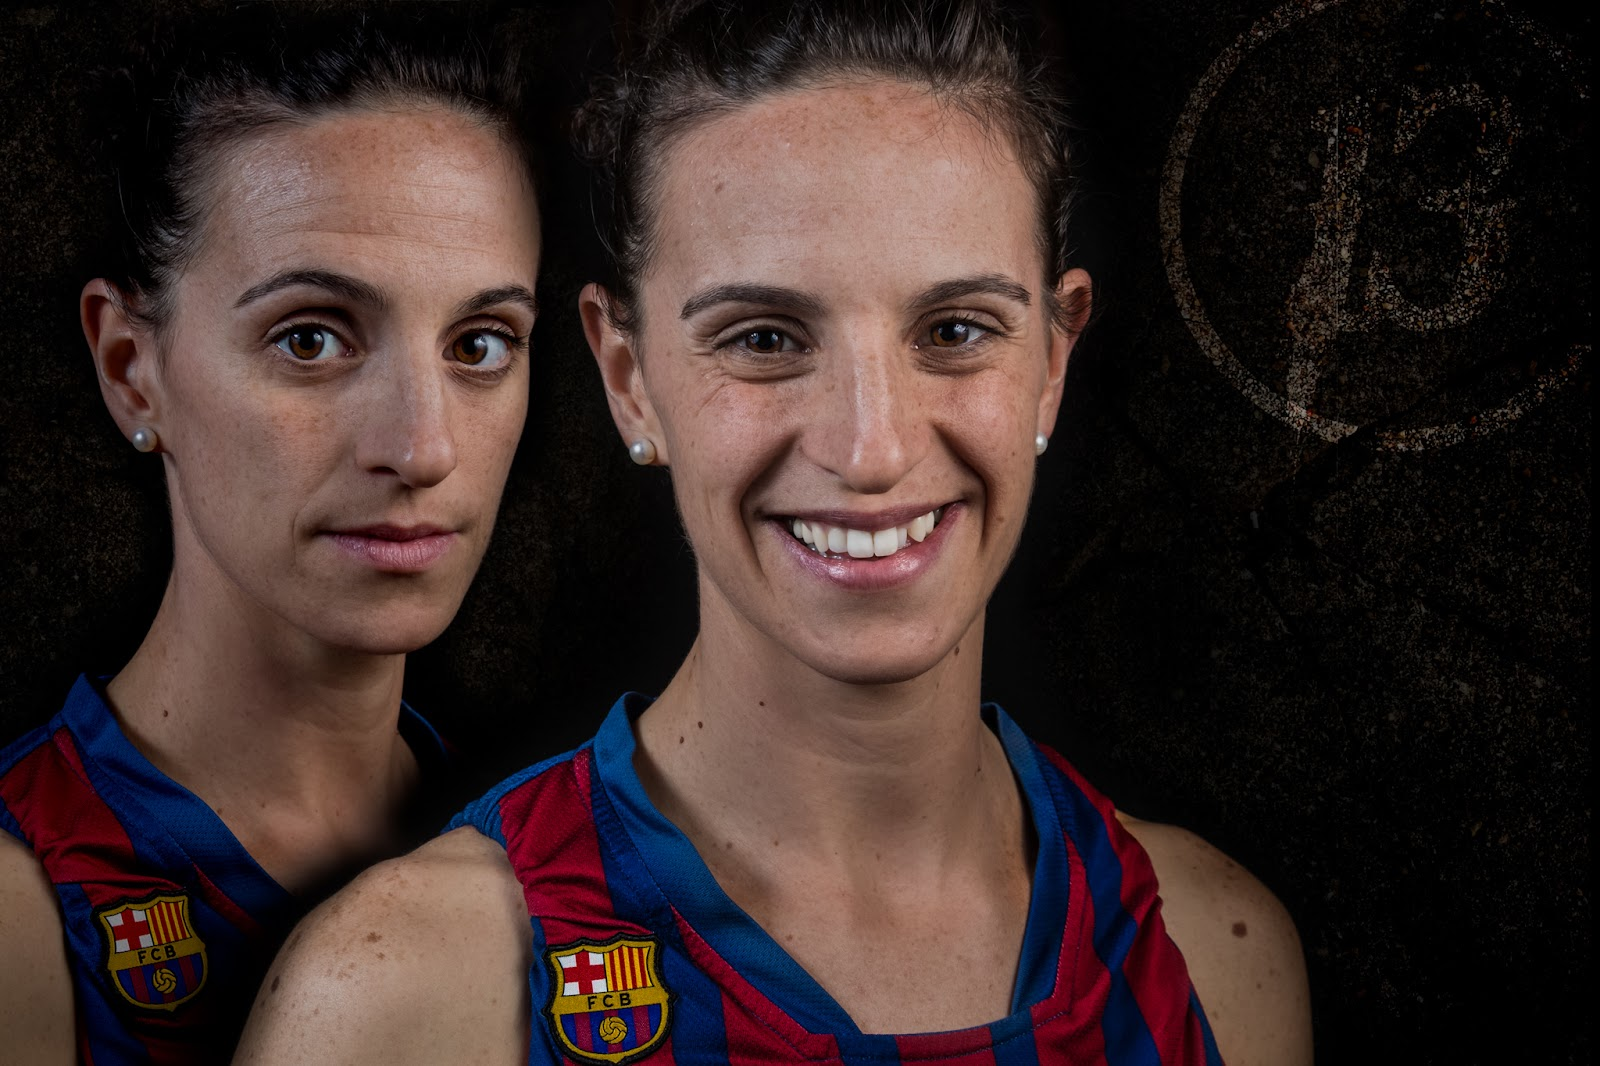 Sandra 13 - CBS Barça Senior Femenino A - 2013 :: 2 x EOS 5D MkIII | ISO100 | Canon 24-105 @45&55mm | f/11 | 1/60s